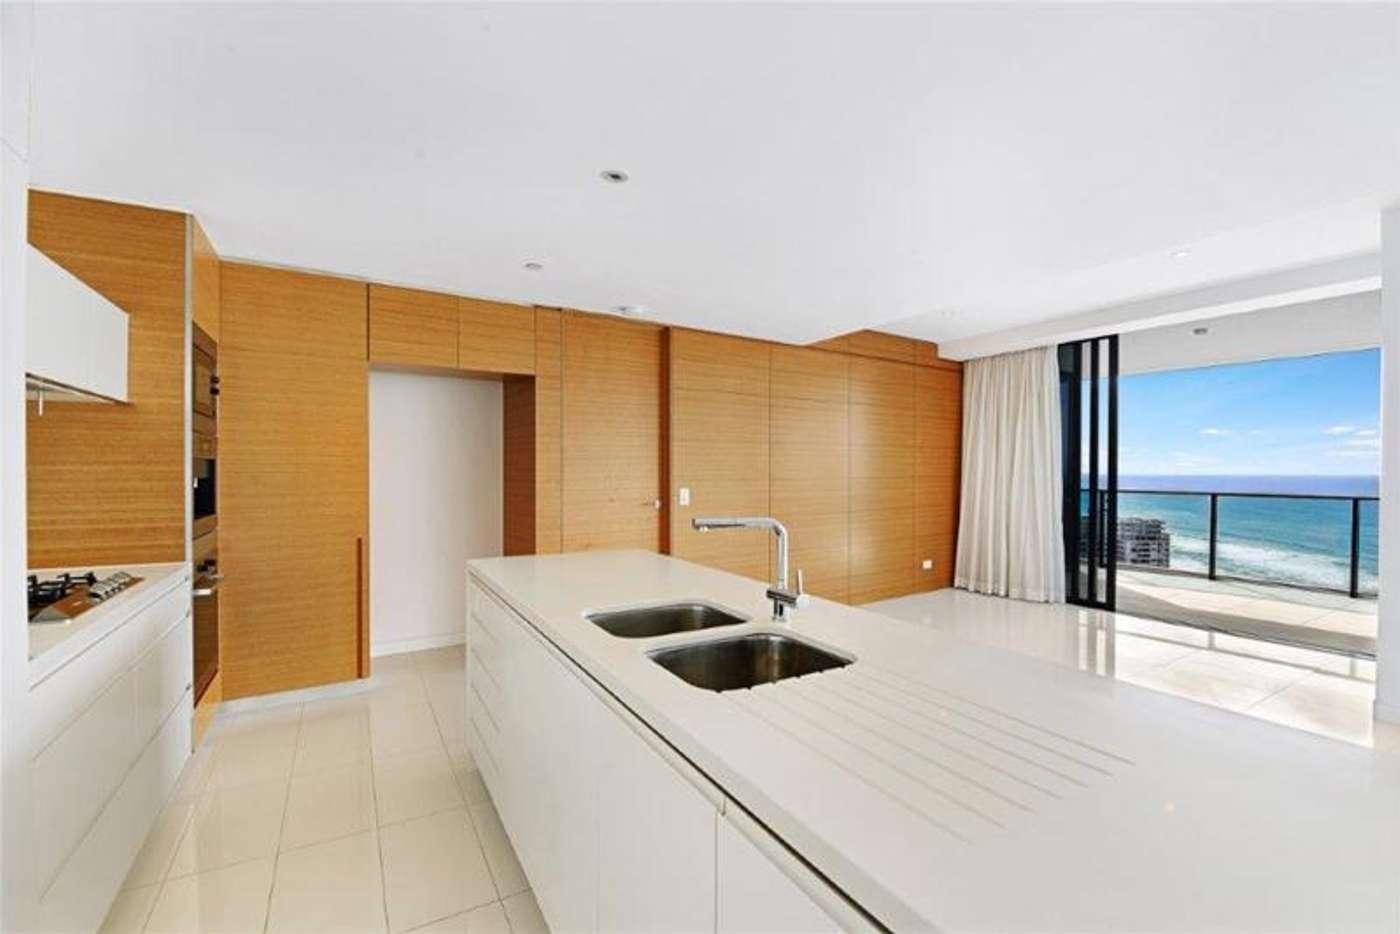 Sixth view of Homely apartment listing, 3802/21 Elizabeth Avenue, Broadbeach QLD 4218